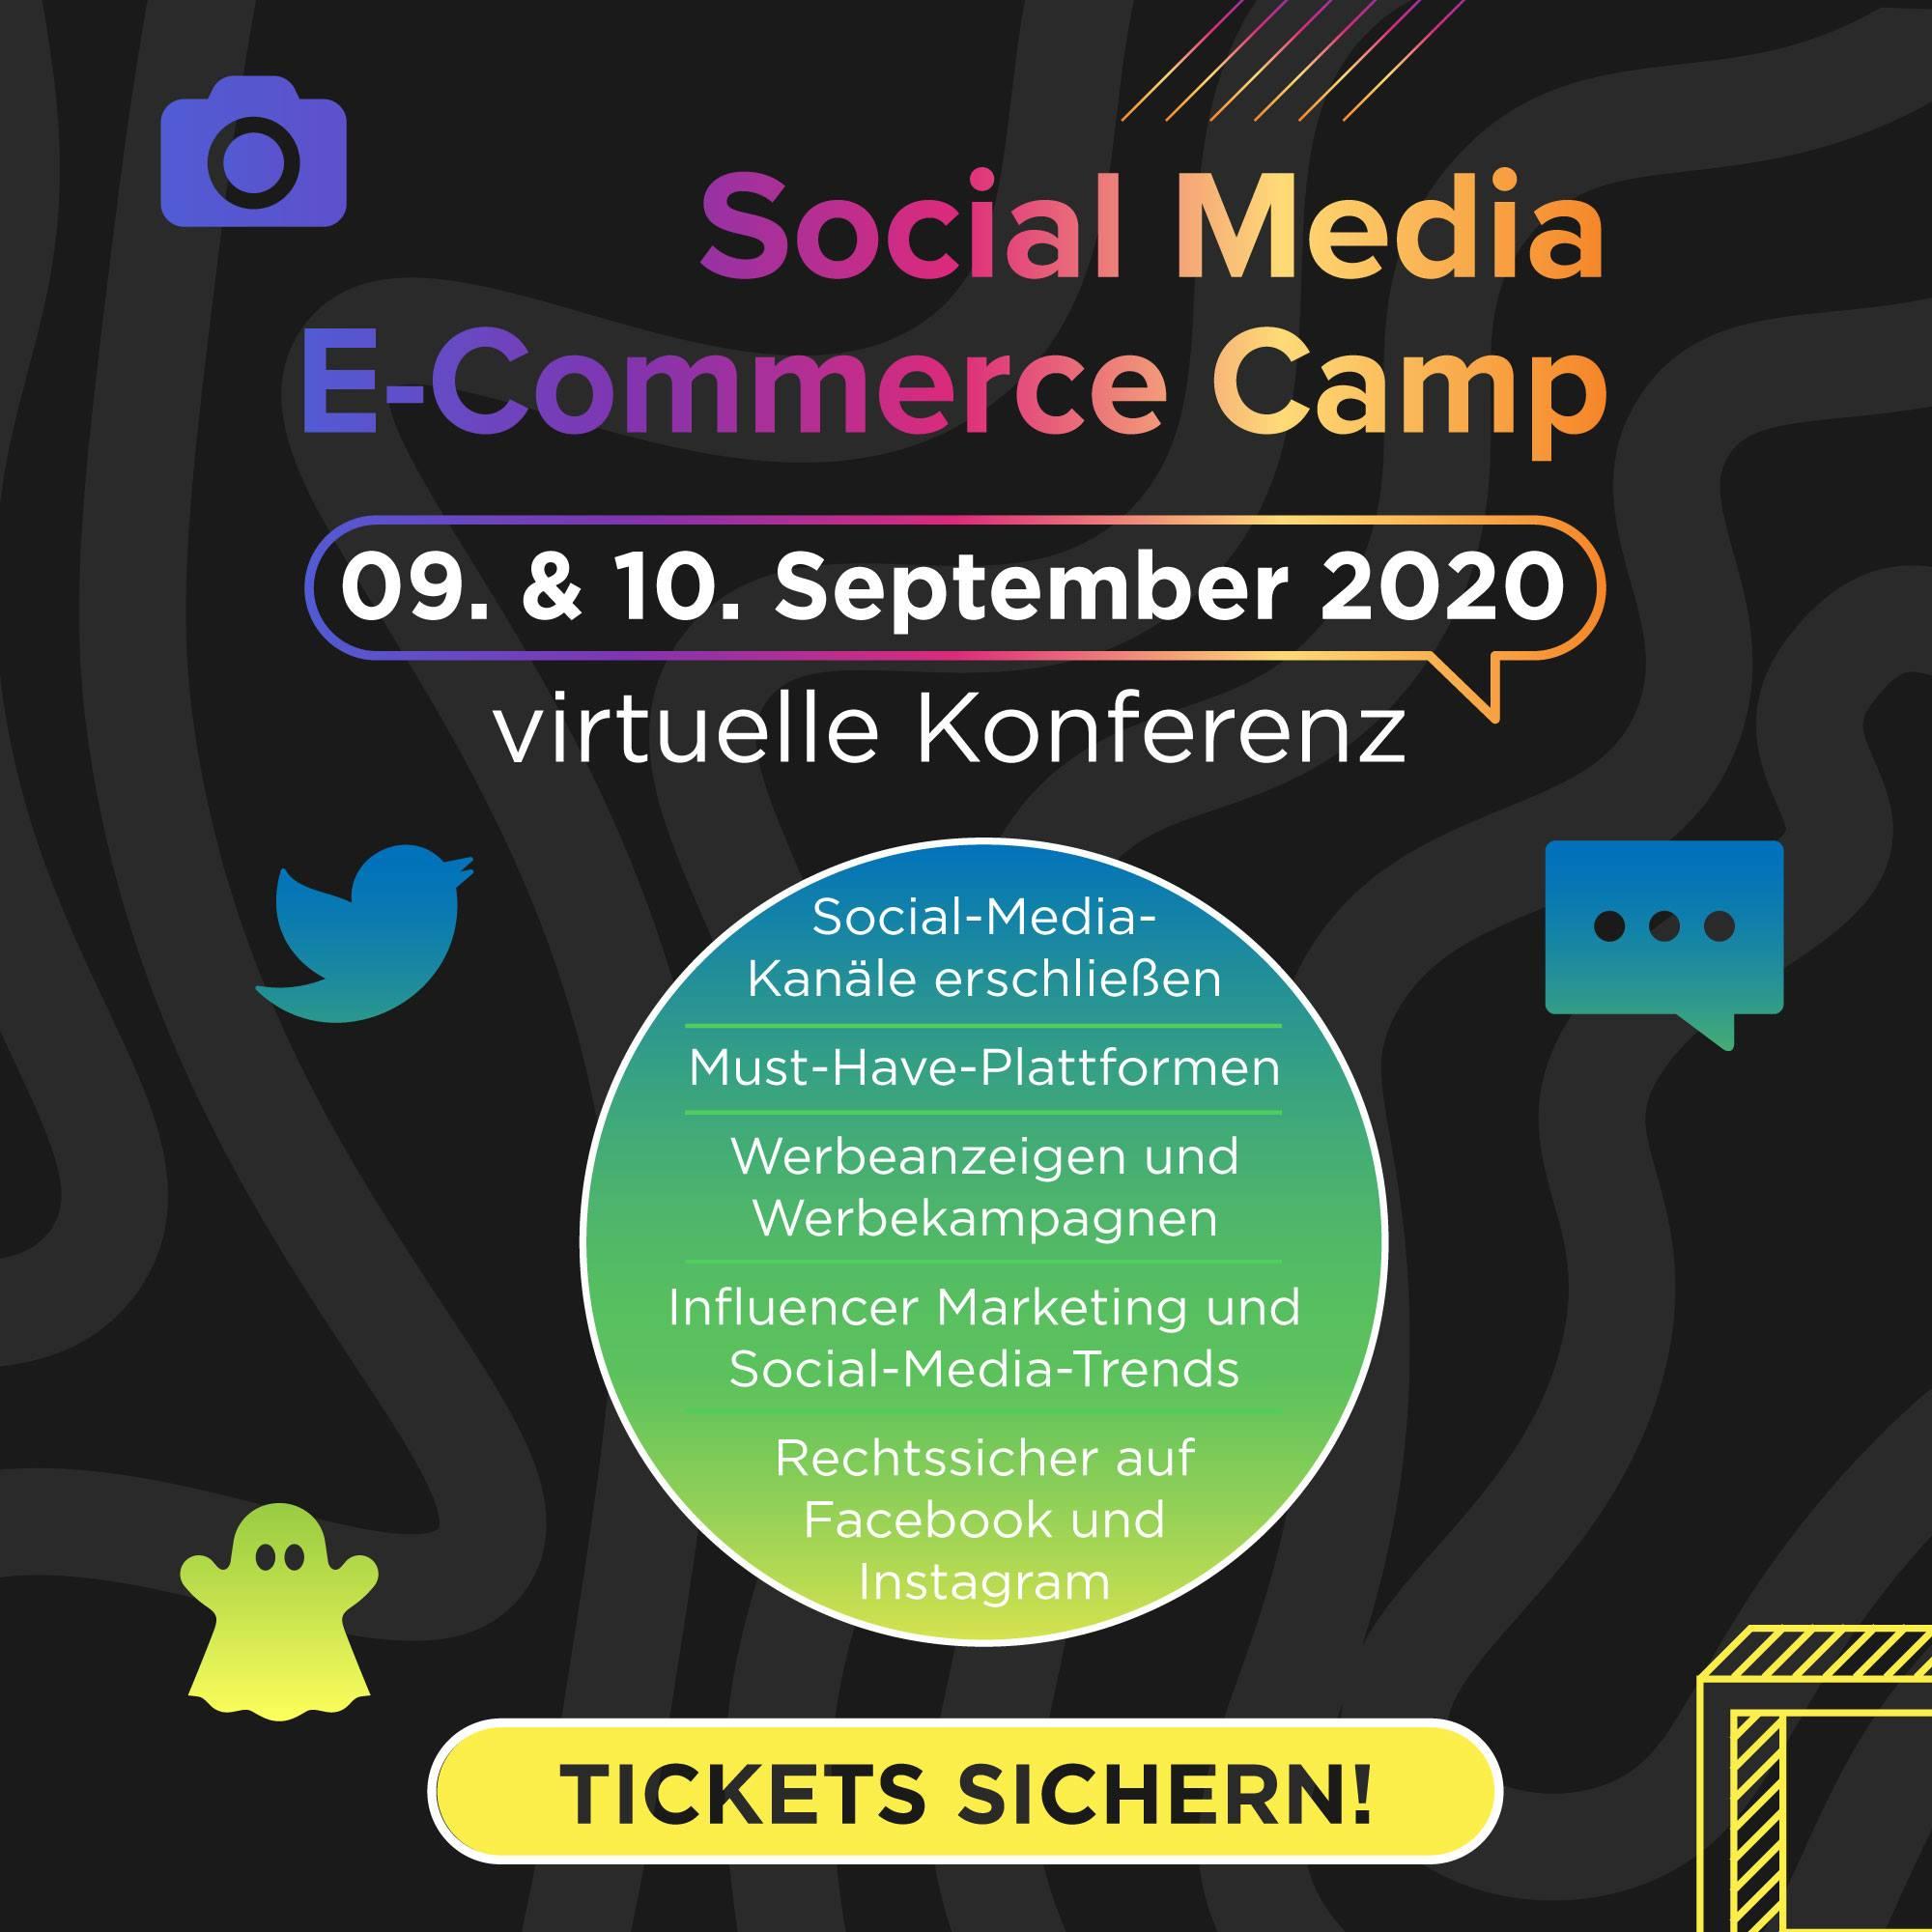 SOCIAL MEDIA E-COMMERCE CAMP